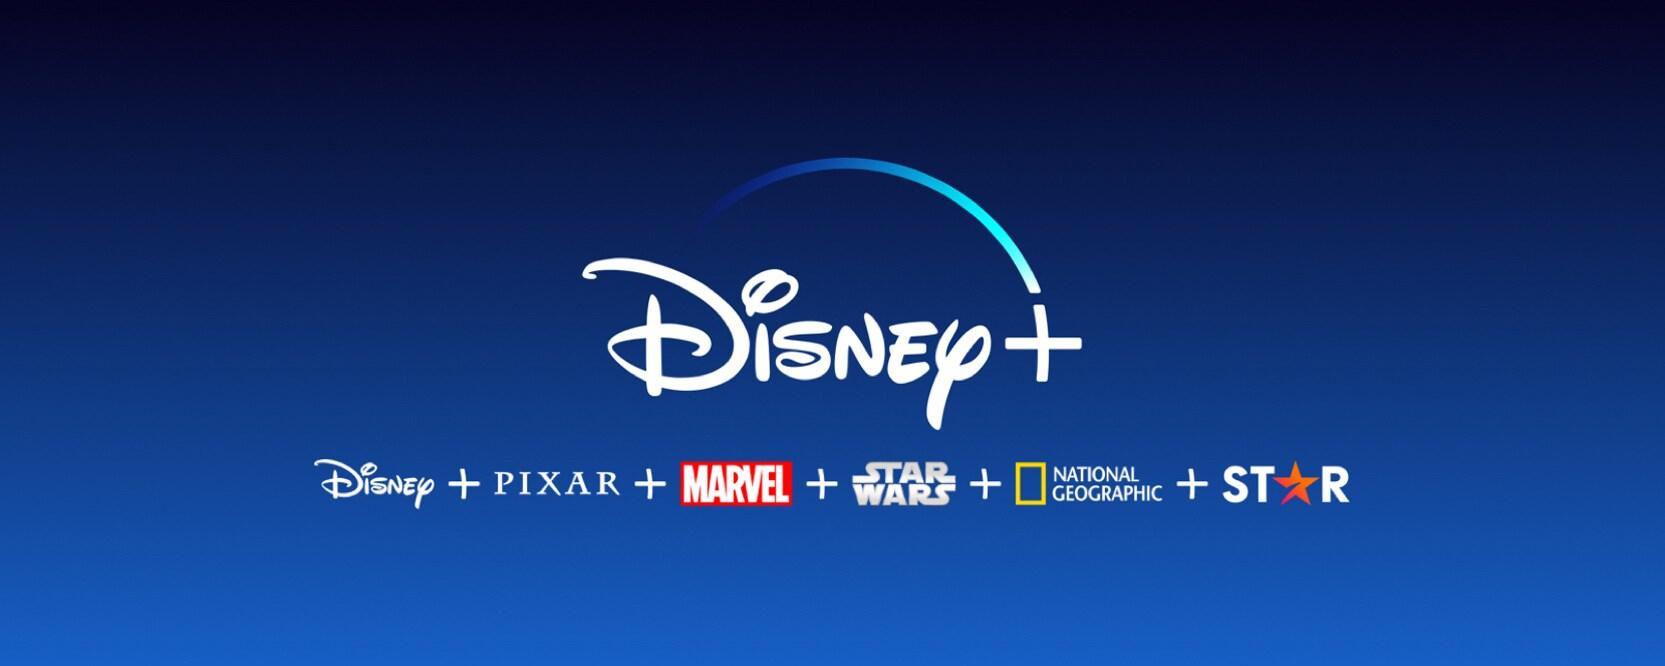 Disney+ Tops 100 Million Global paid subscriber milestone